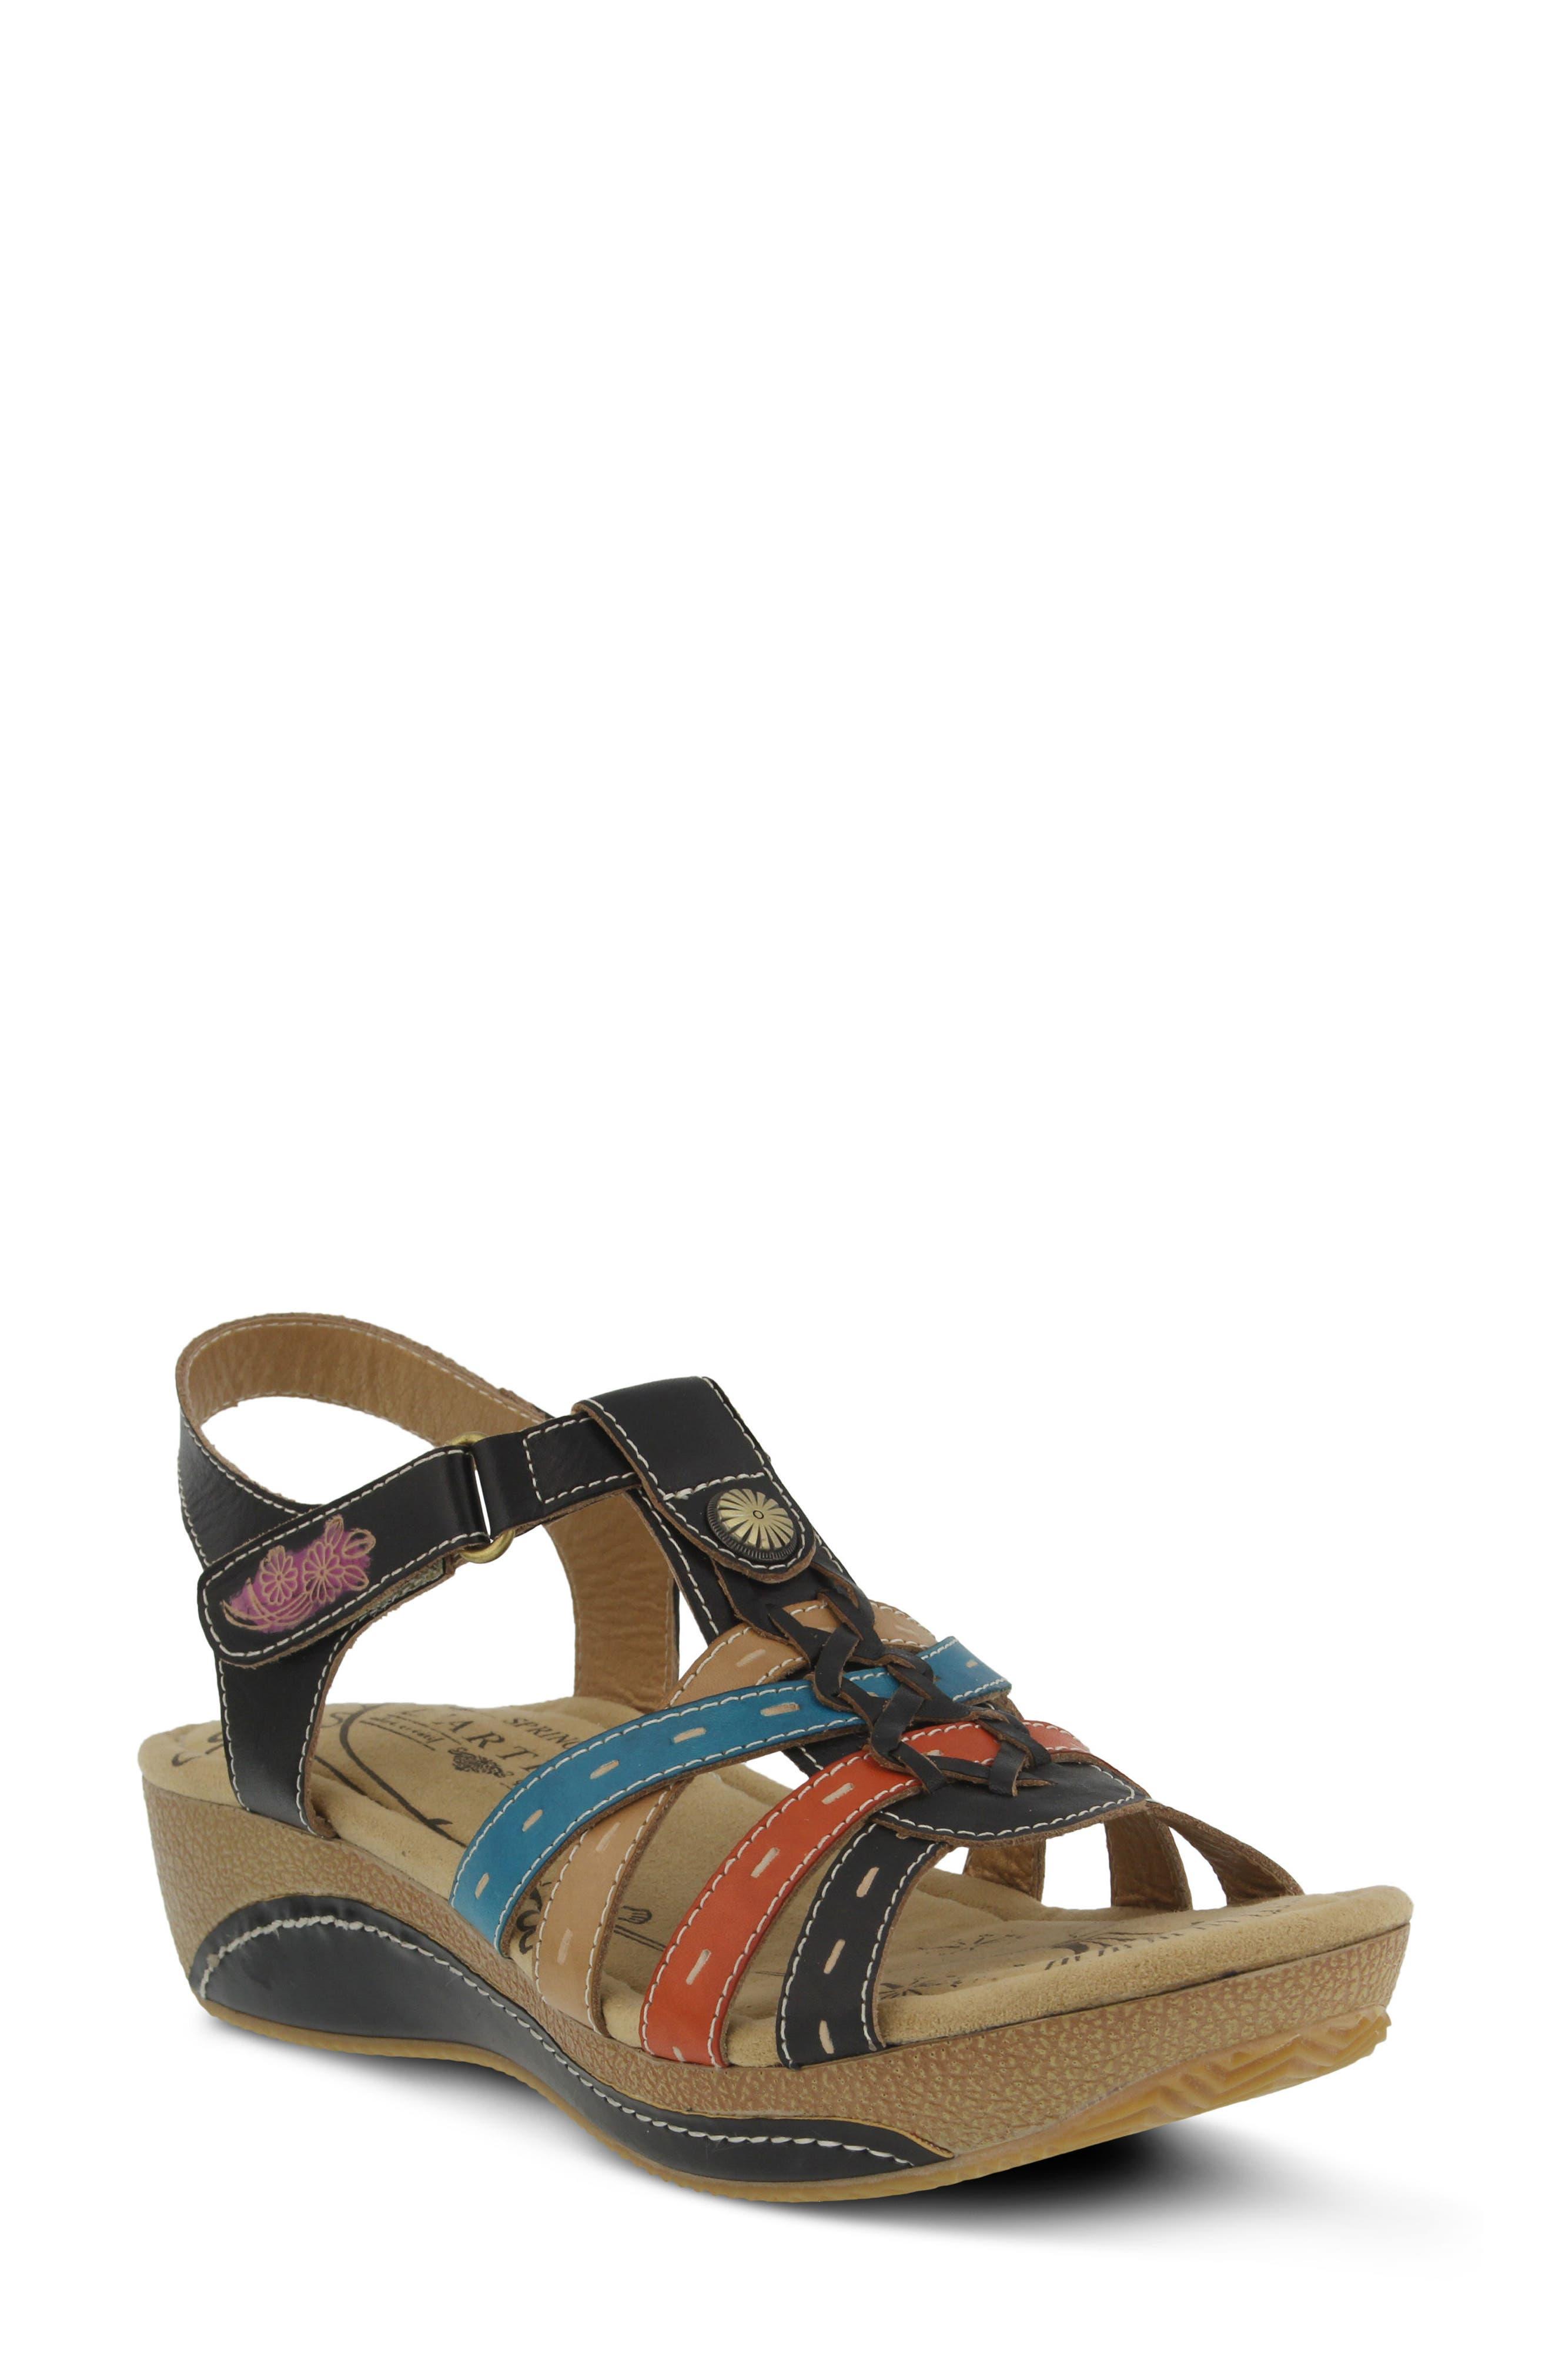 L'Artiste Cloe Sandal,                         Main,                         color, BLACK LEATHER